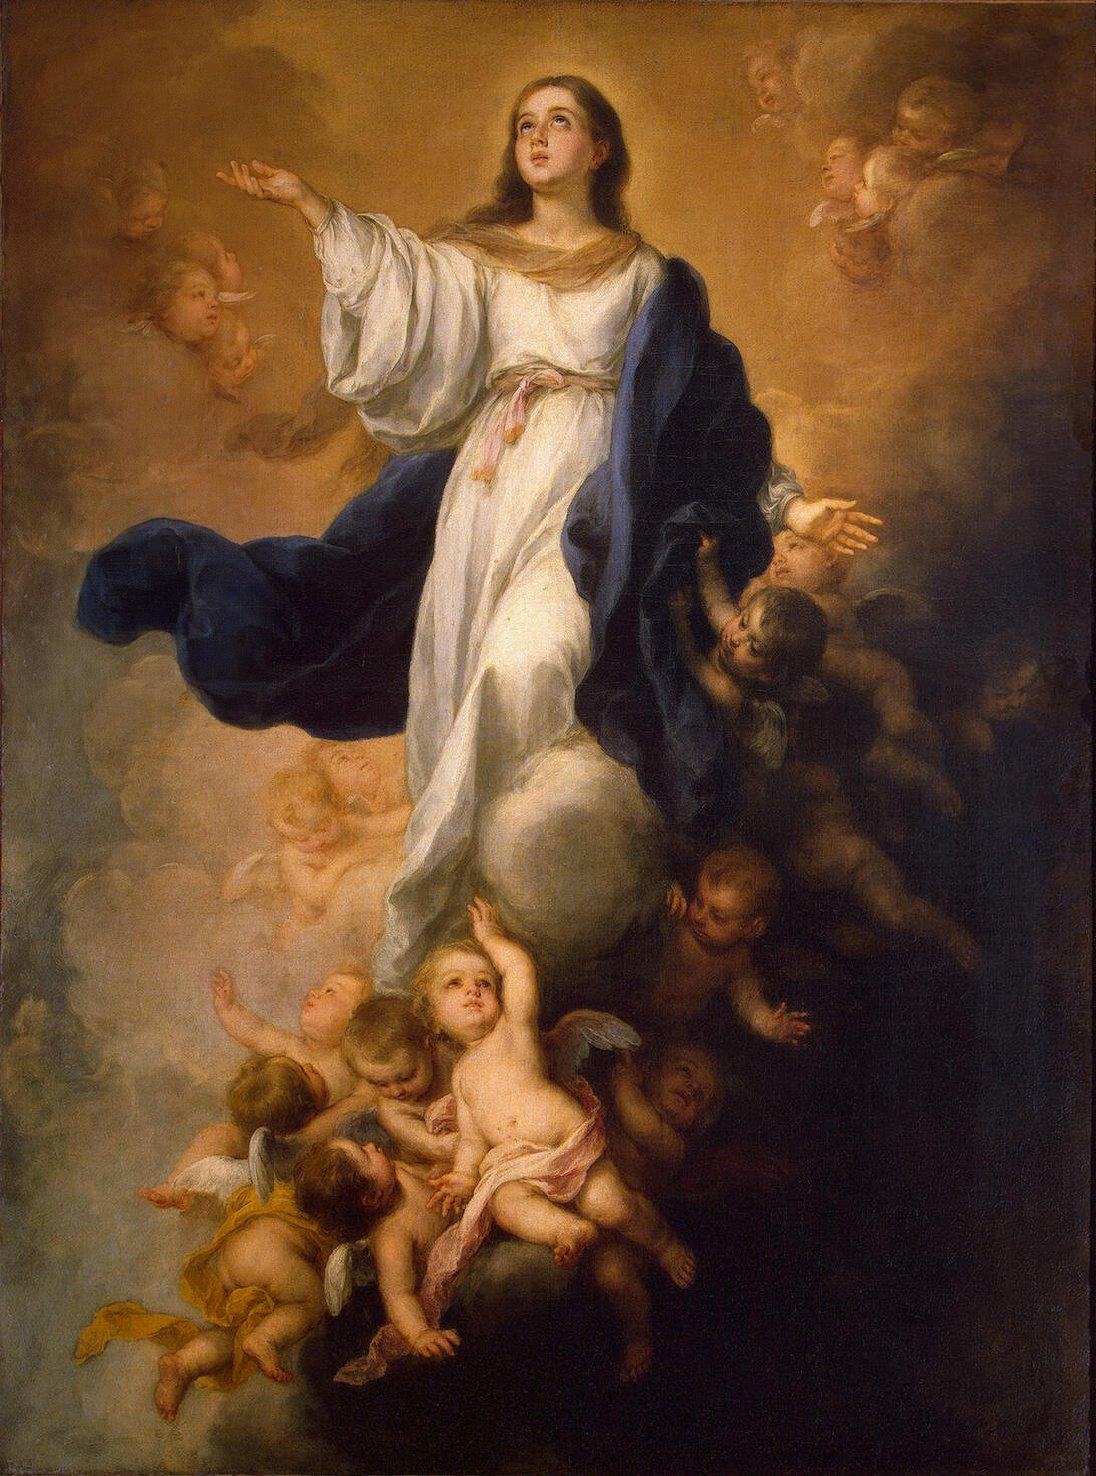 Bartolomé Esteban Murillo, Assumption of the Virgin, c. 1680